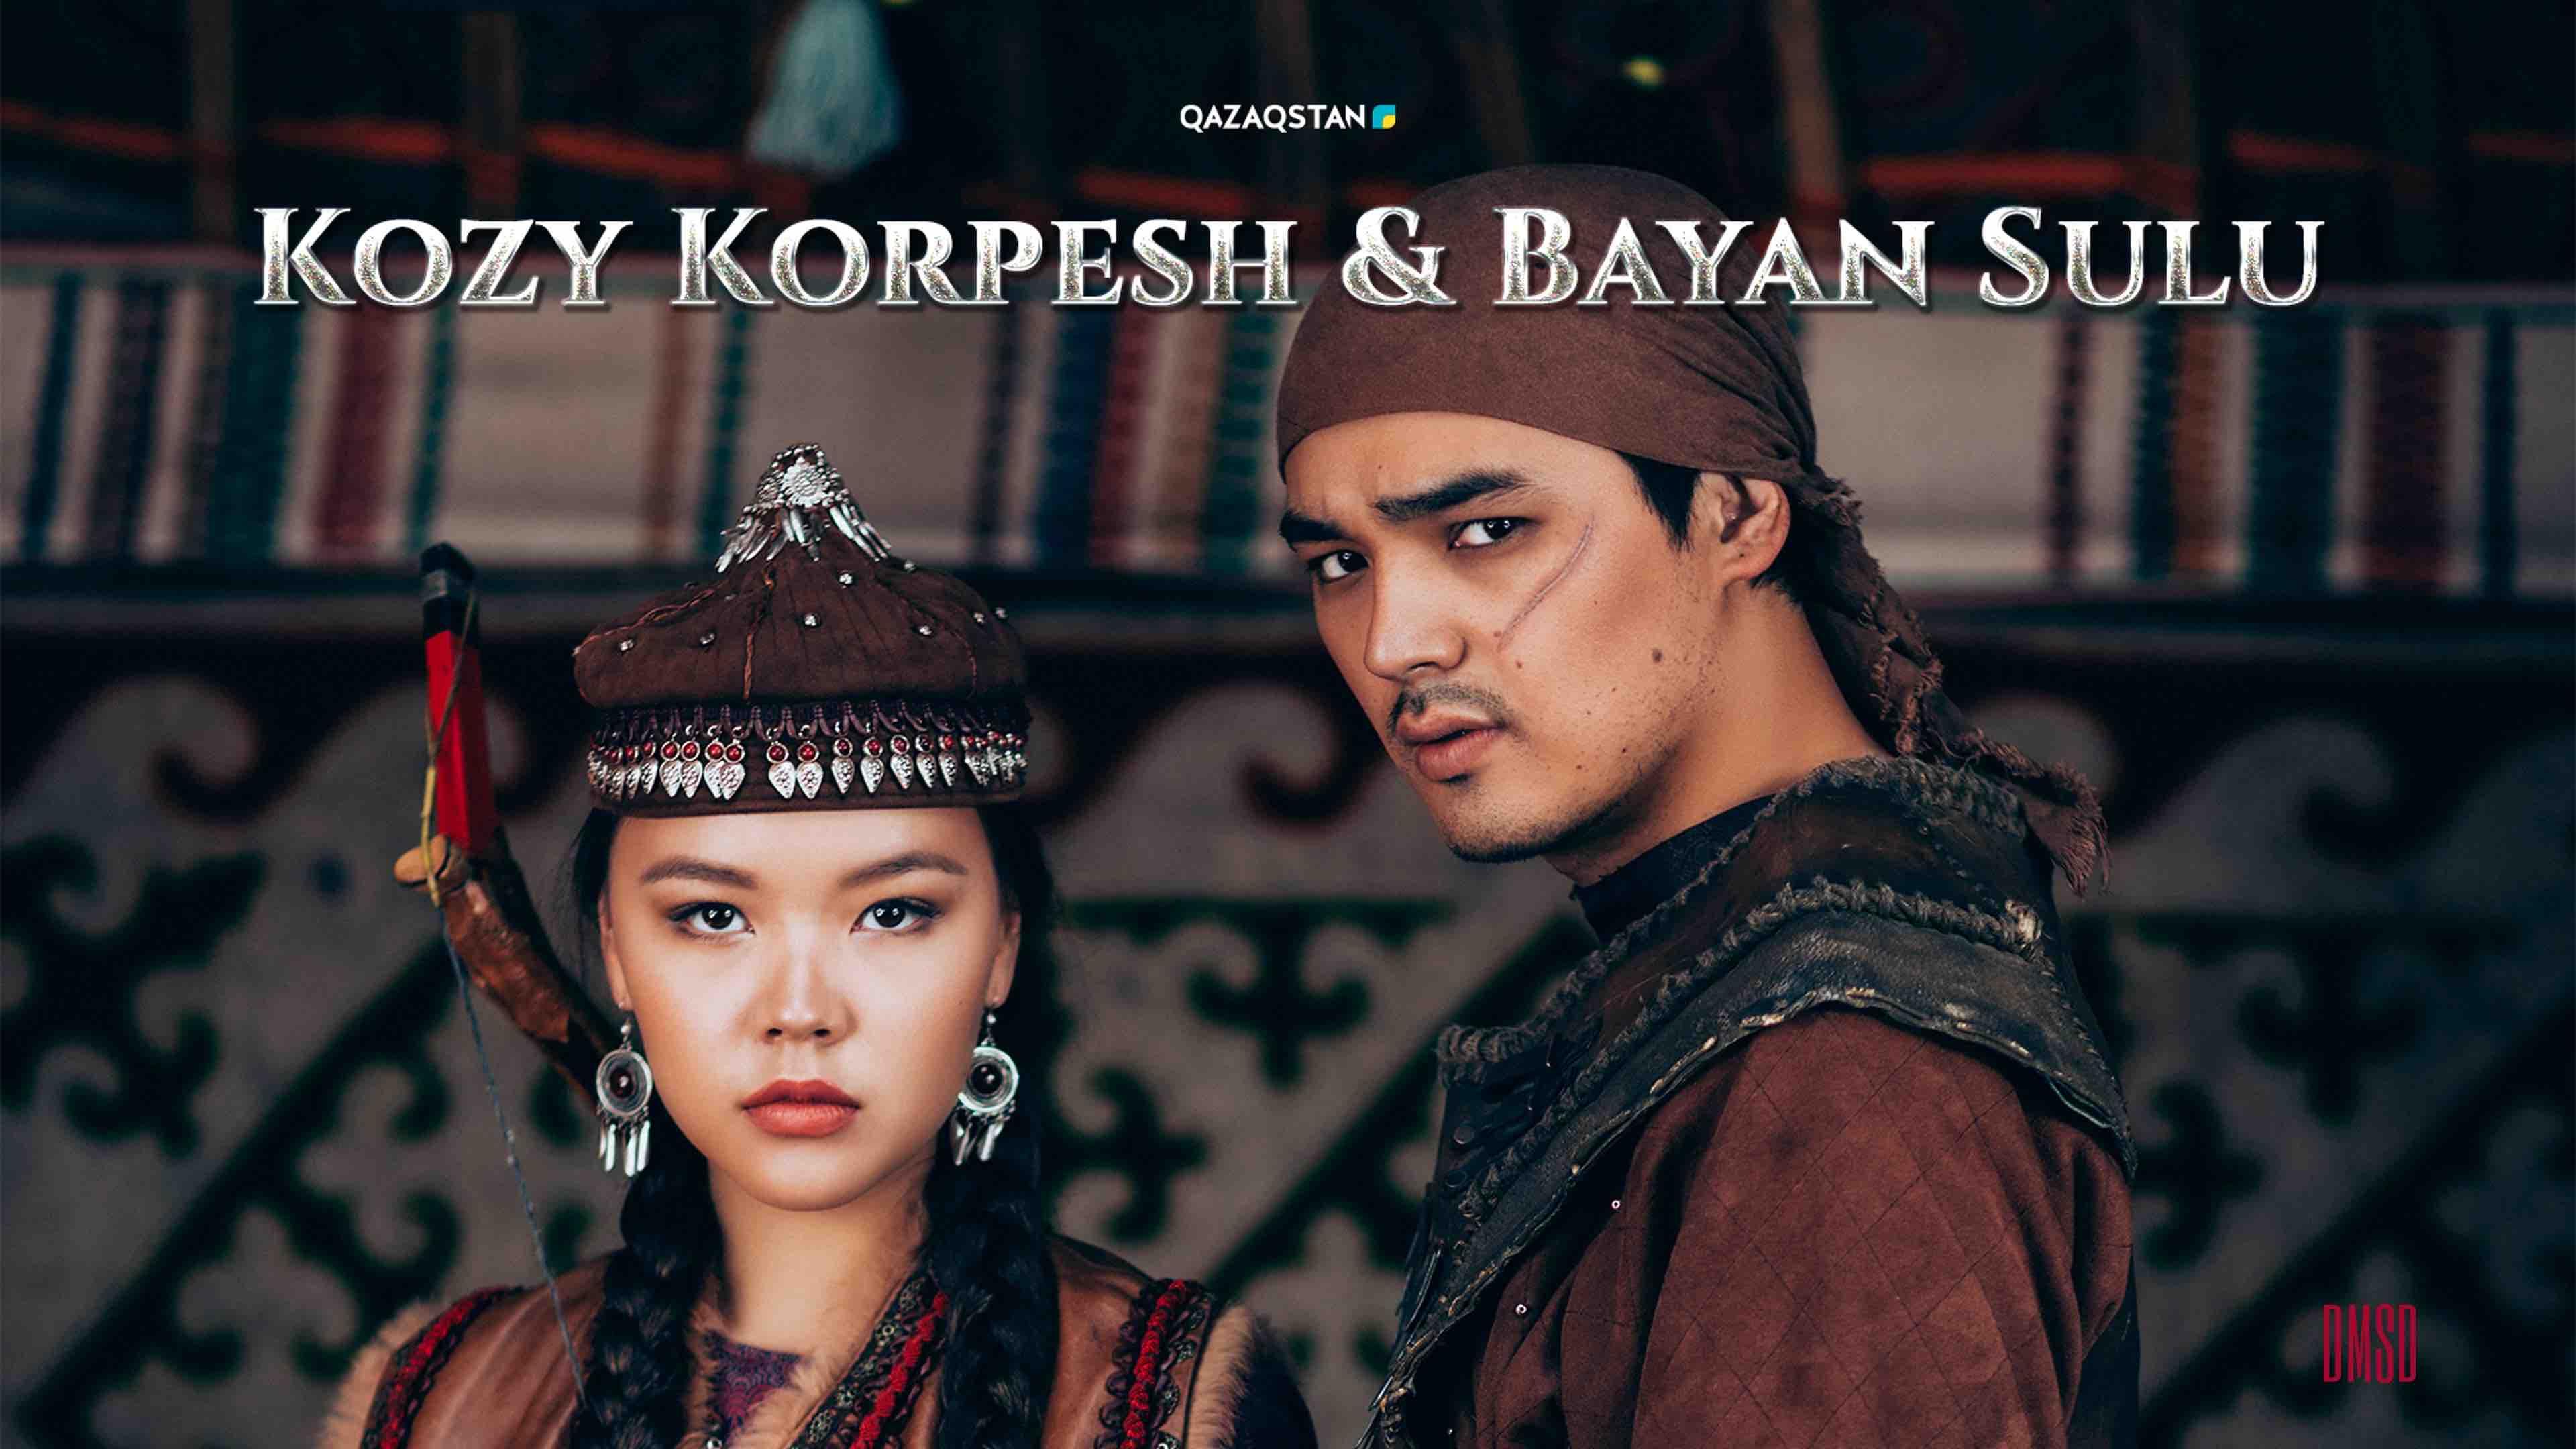 Kozy Korpesh & Bayan Sulu [2015]